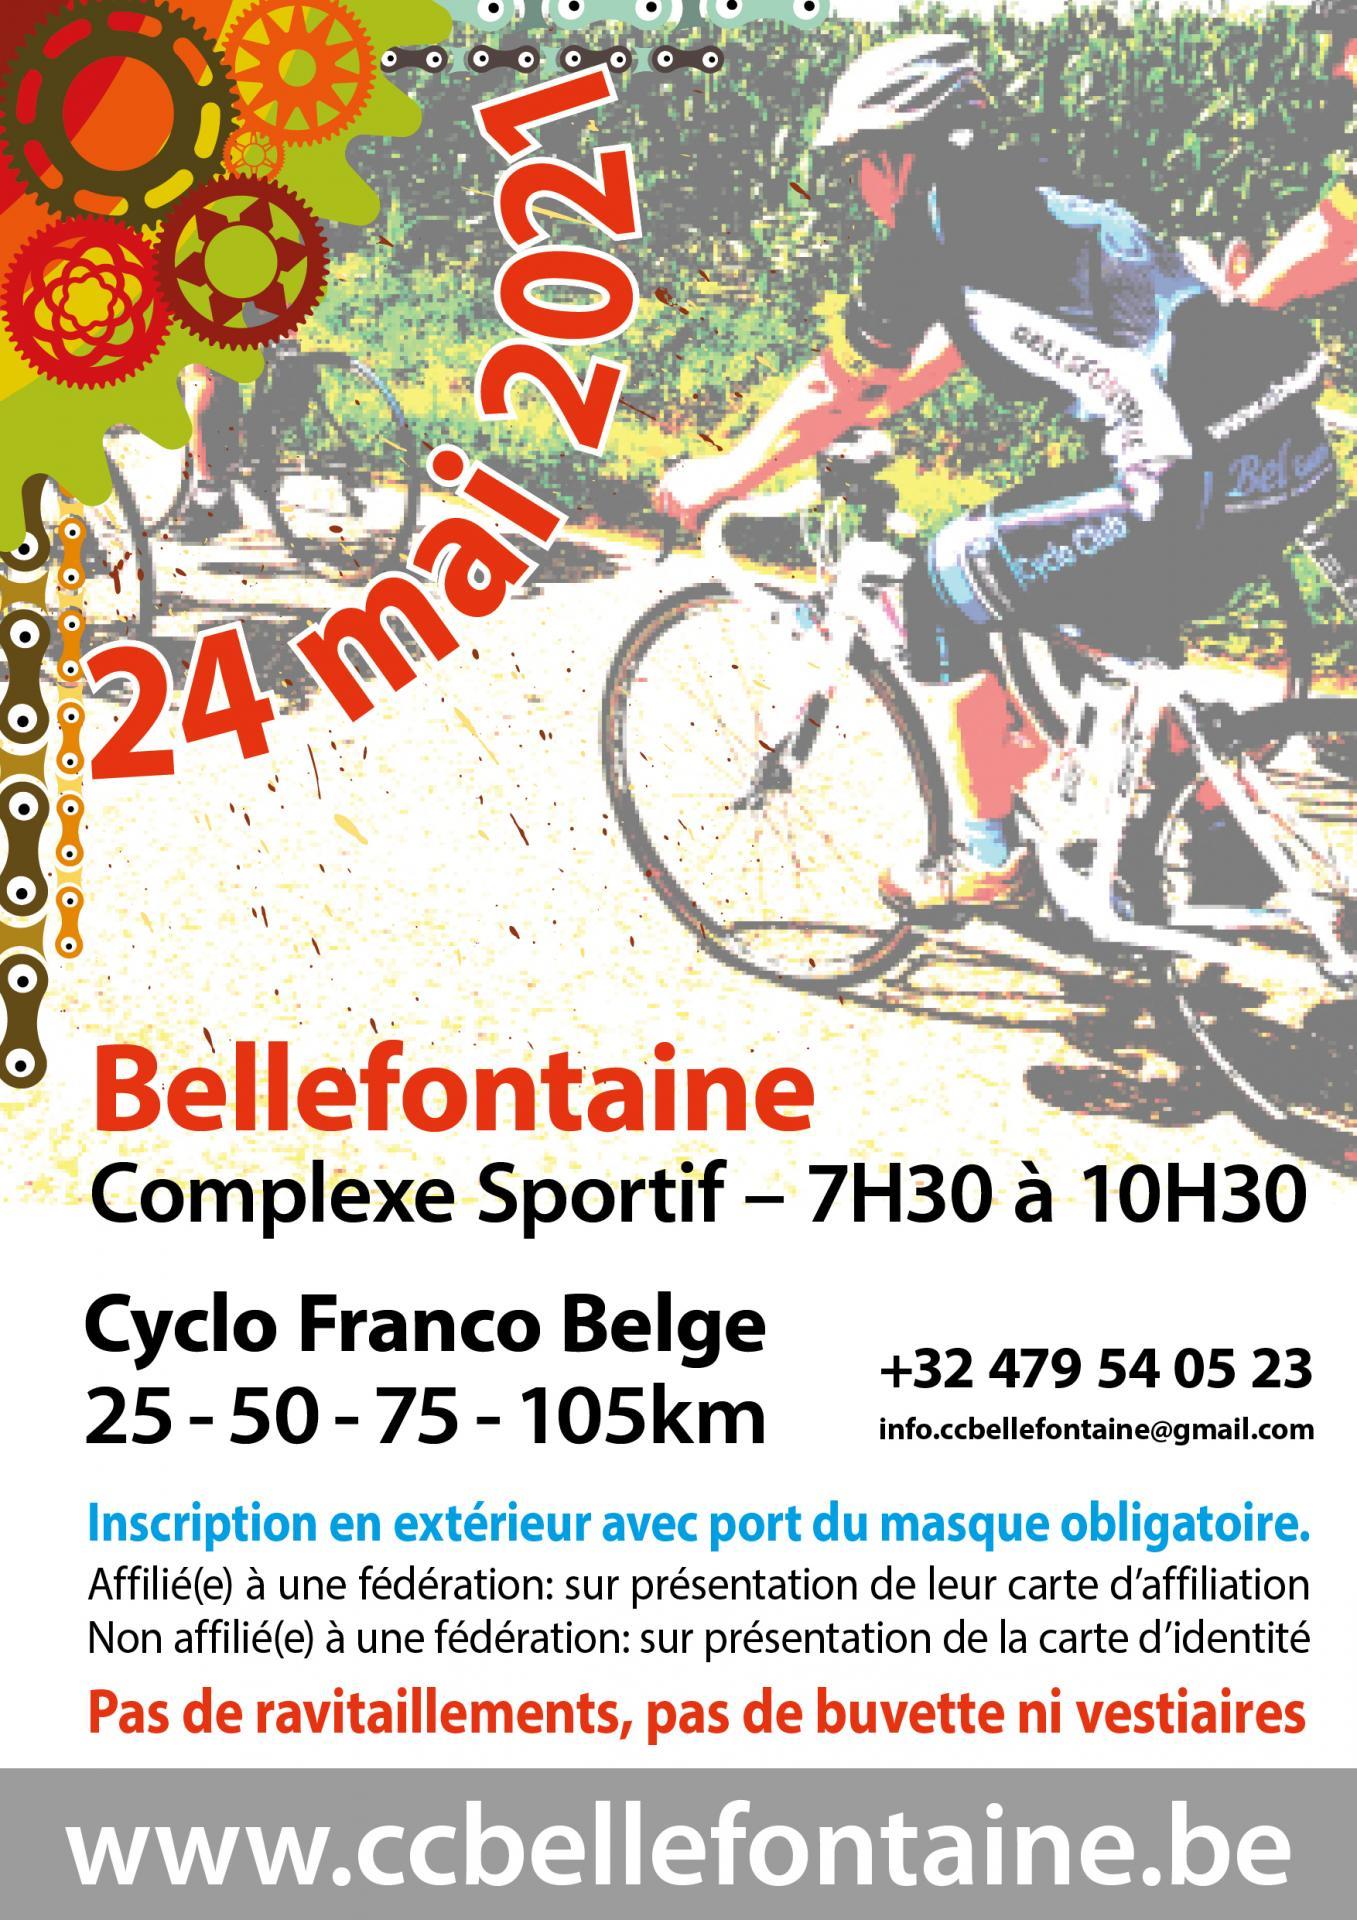 Randos cyclos samedi 22/05 et lundi 24/05 (Pentecôte) Ccb-aff-francobelge2021